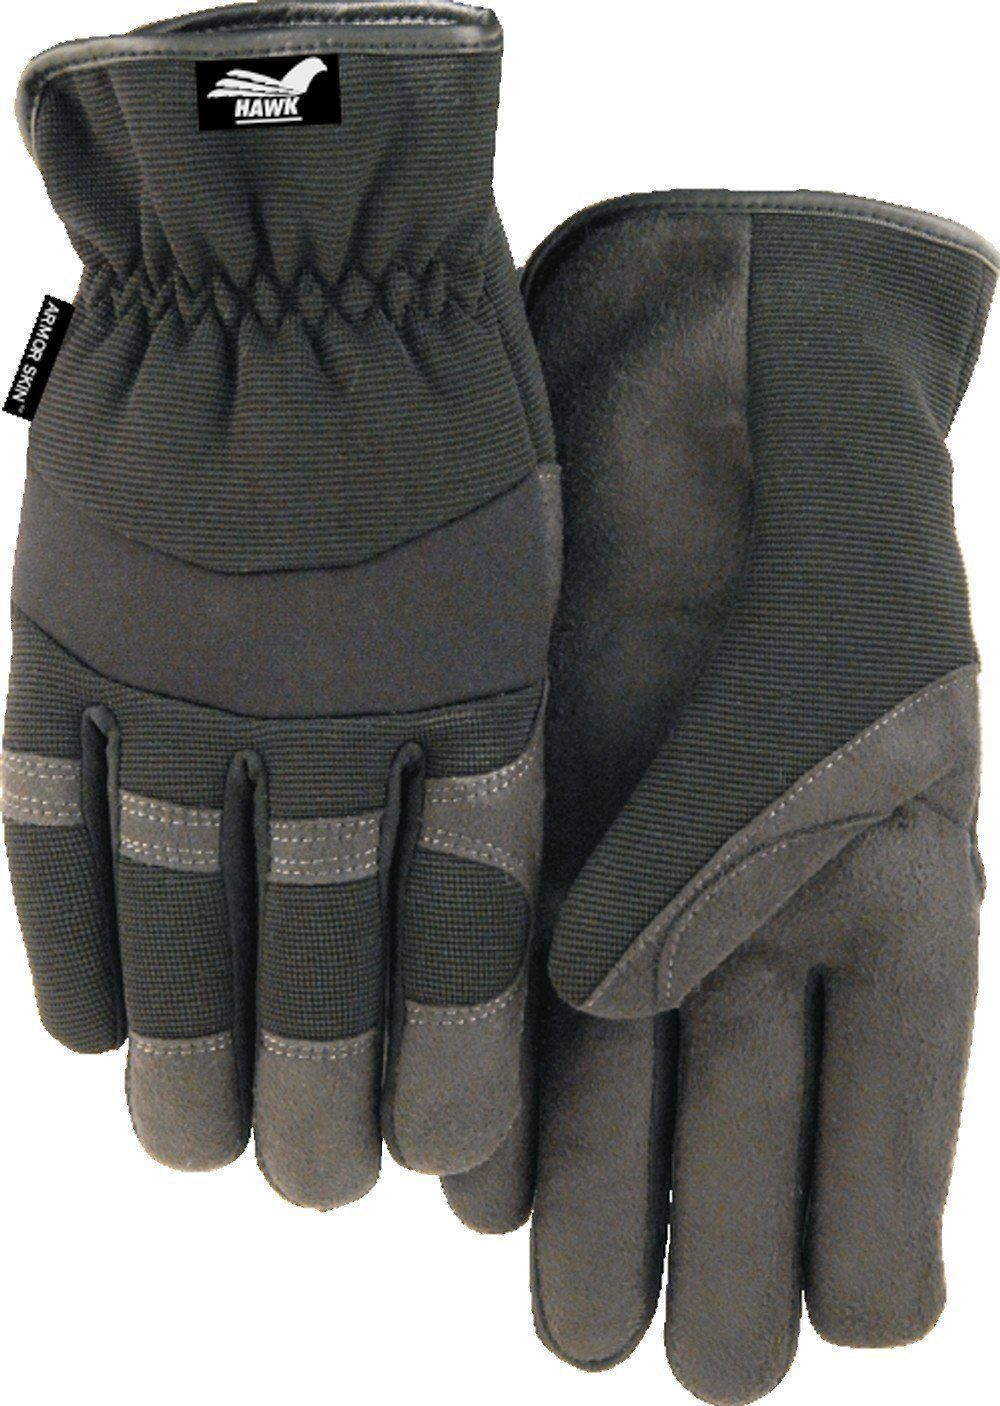 Majestic Hawk 2136bk Black Armor Skin Mechanic Style Gloves Slip